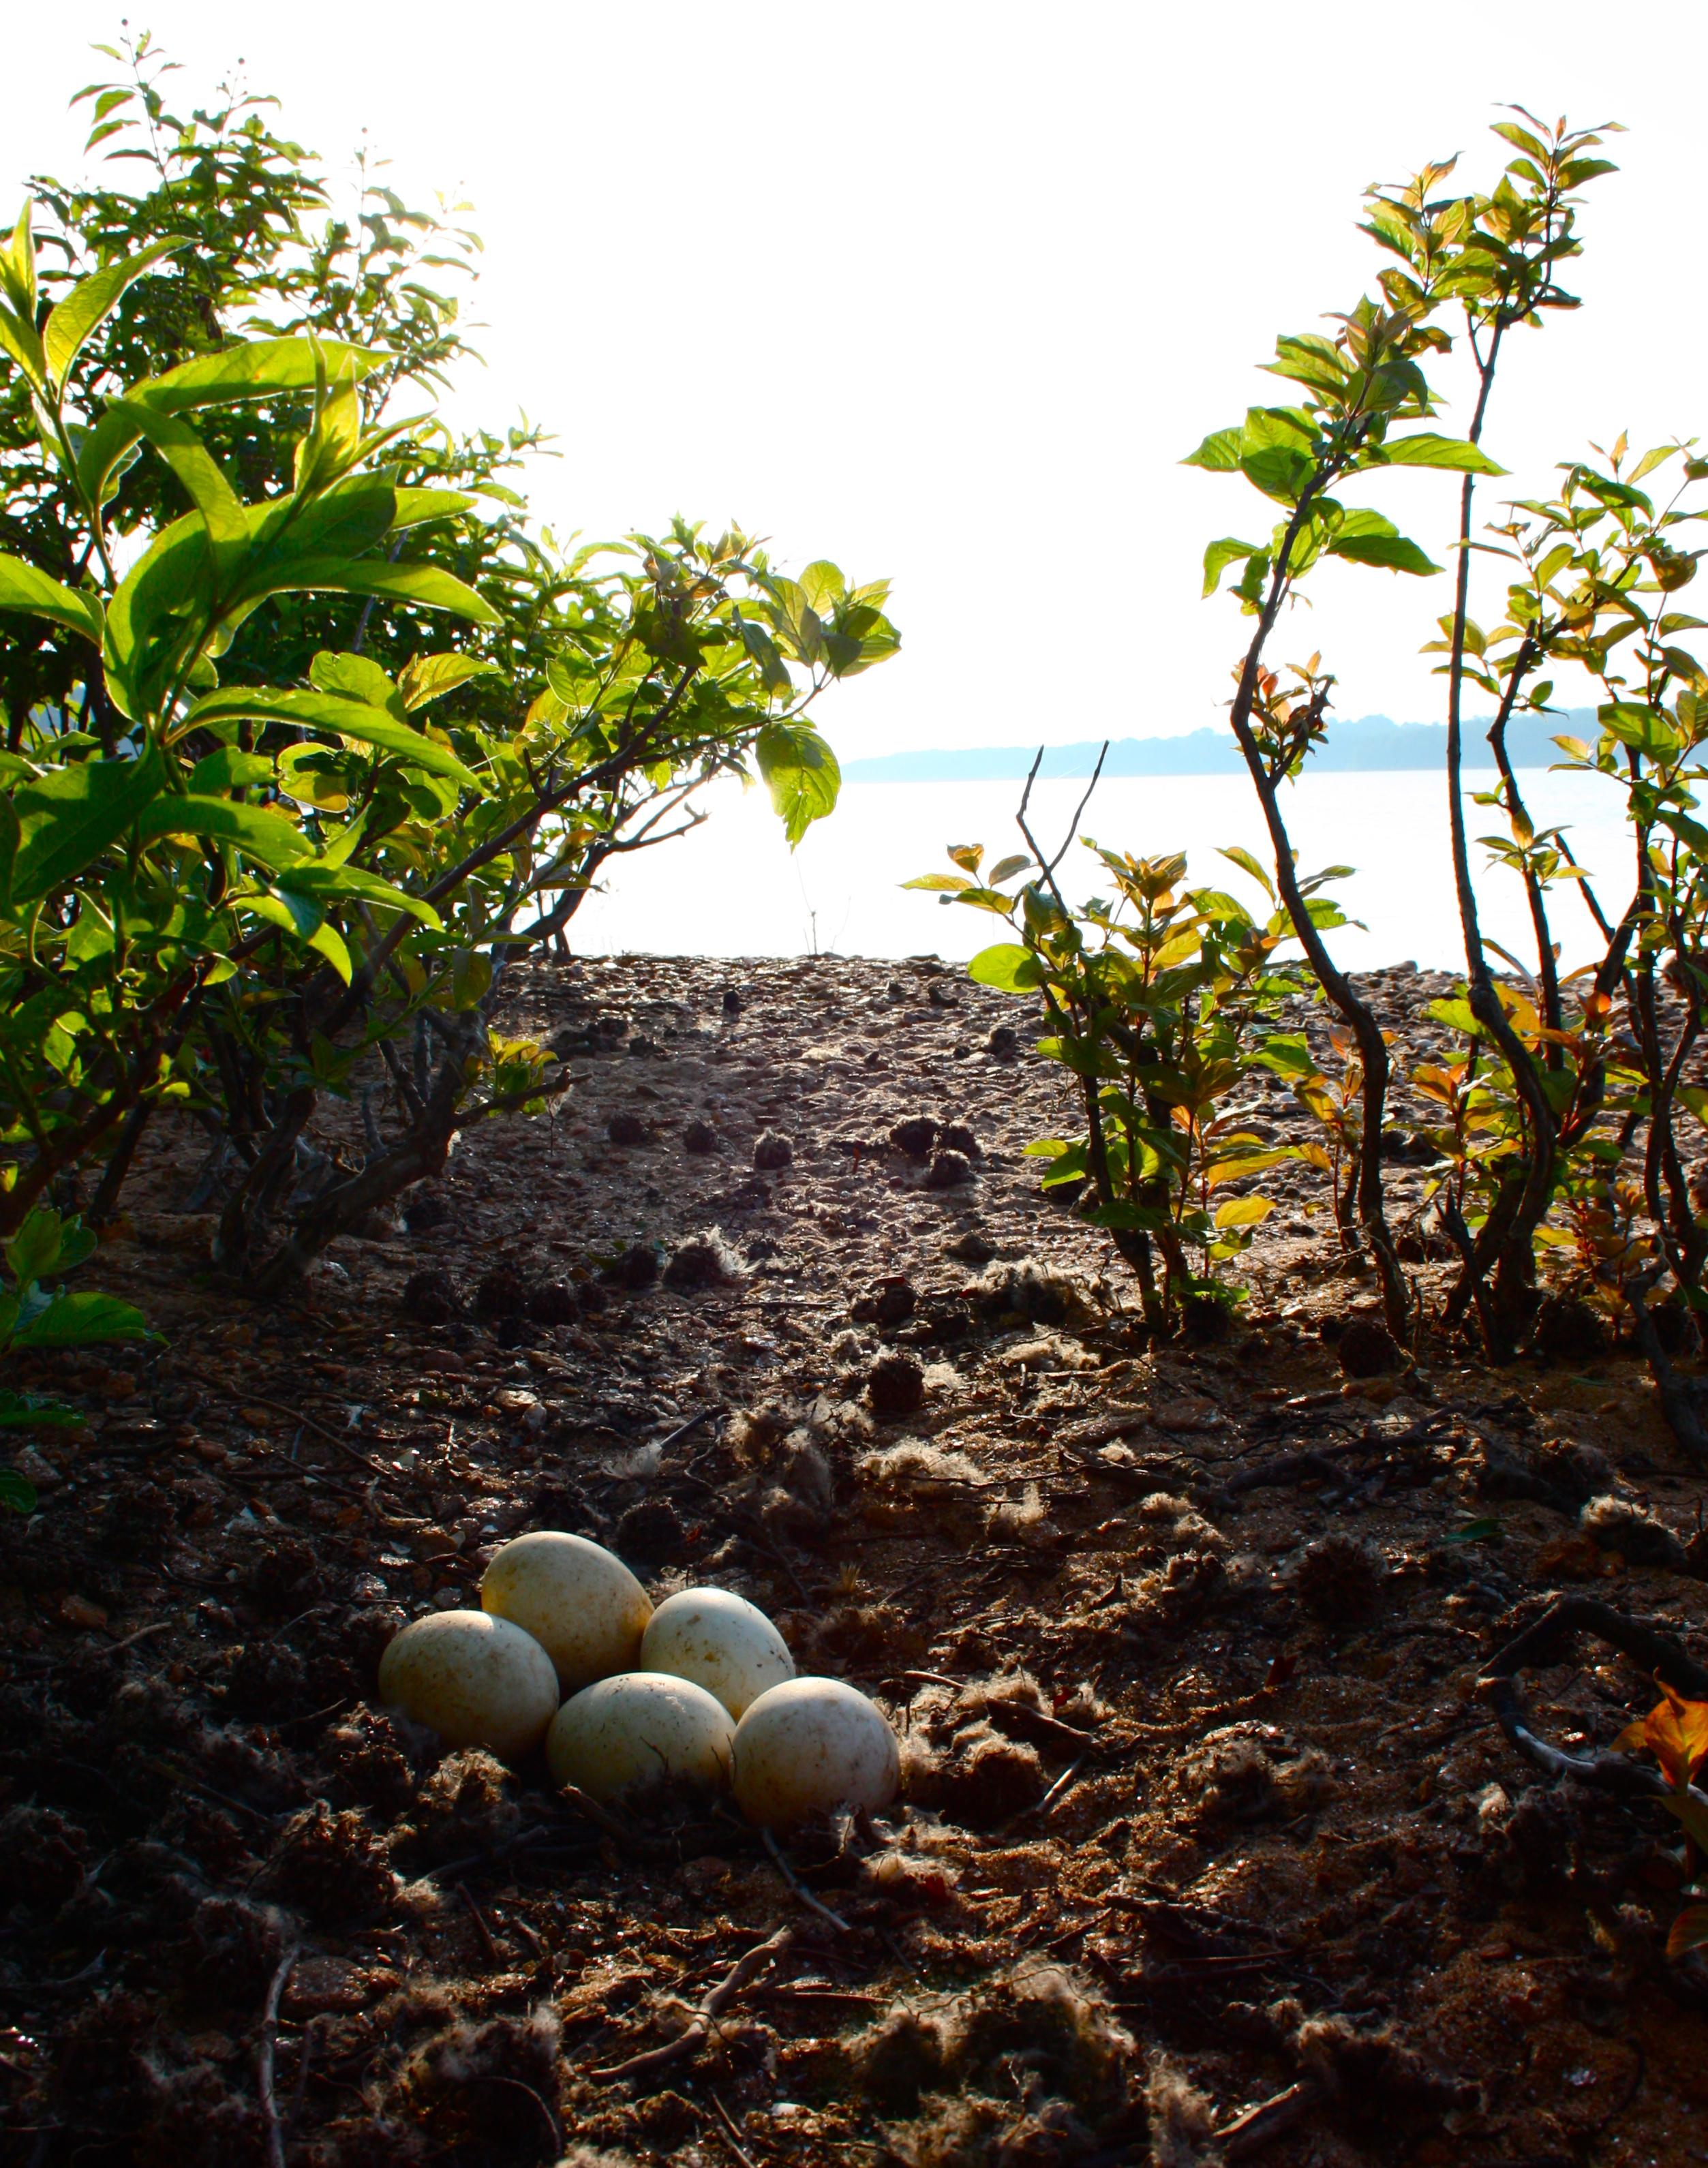 Goose Eggs on Little Island, Lake Hartwell #2